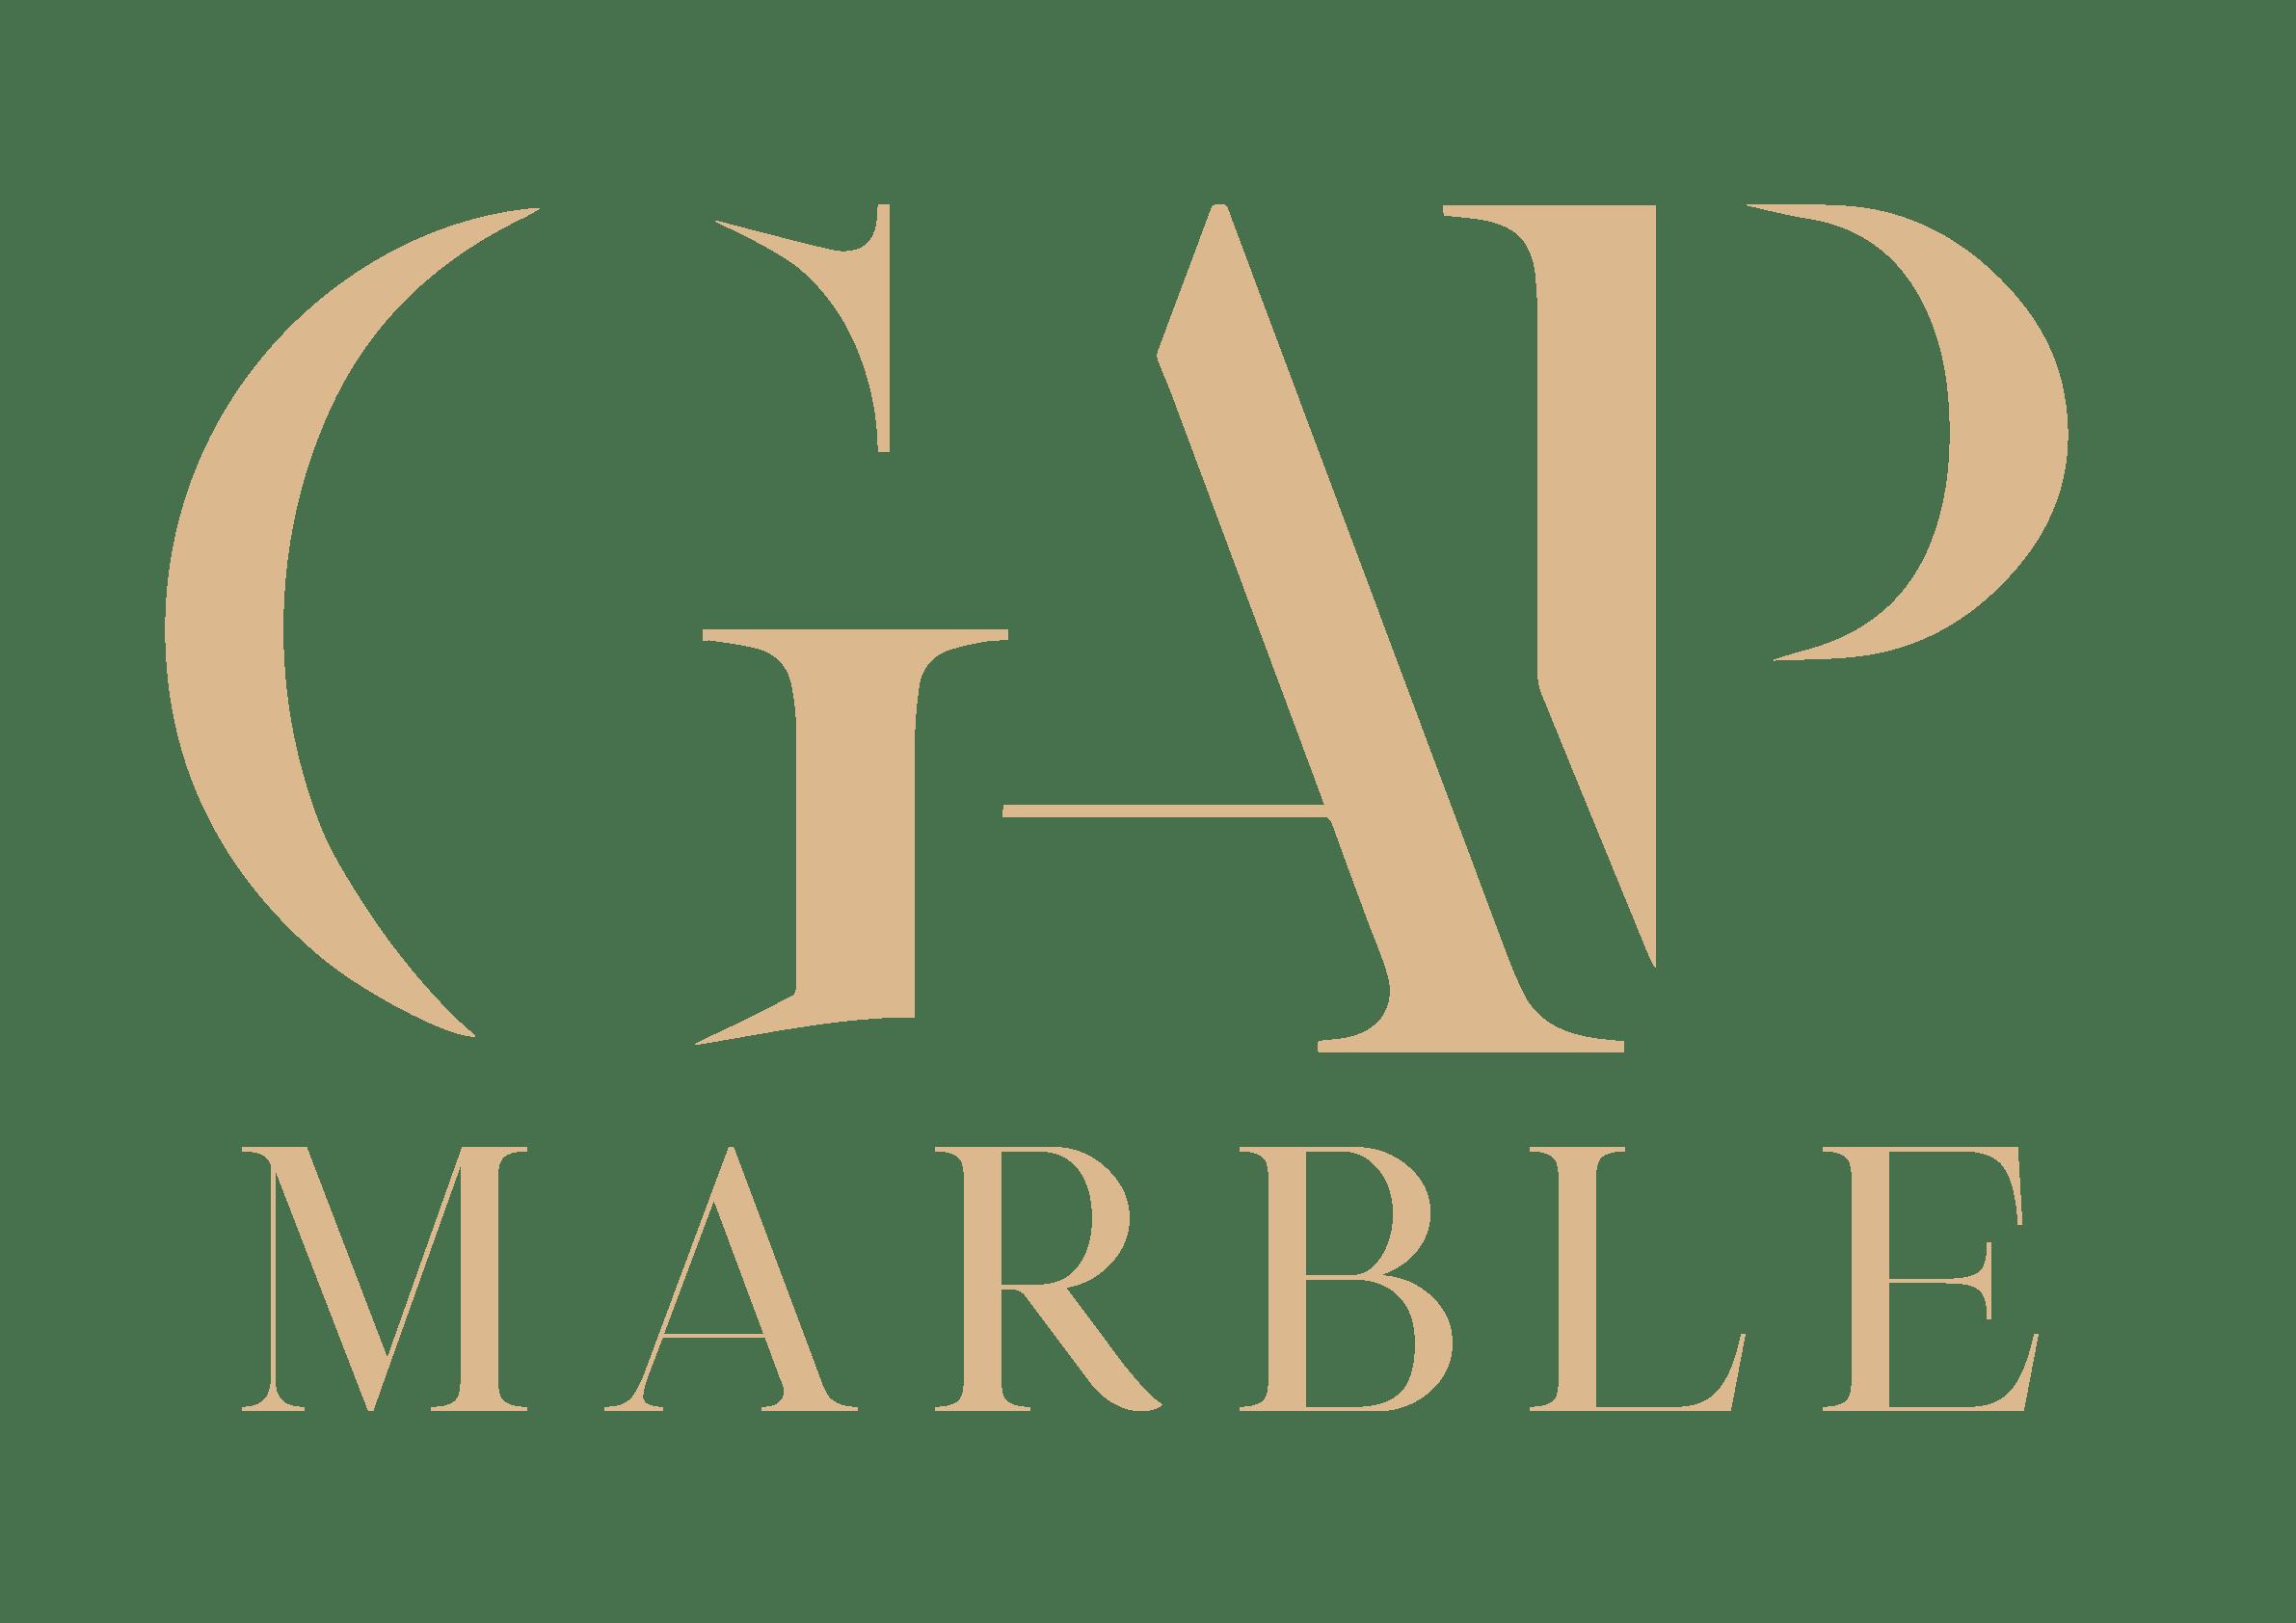 GAP MARBLE